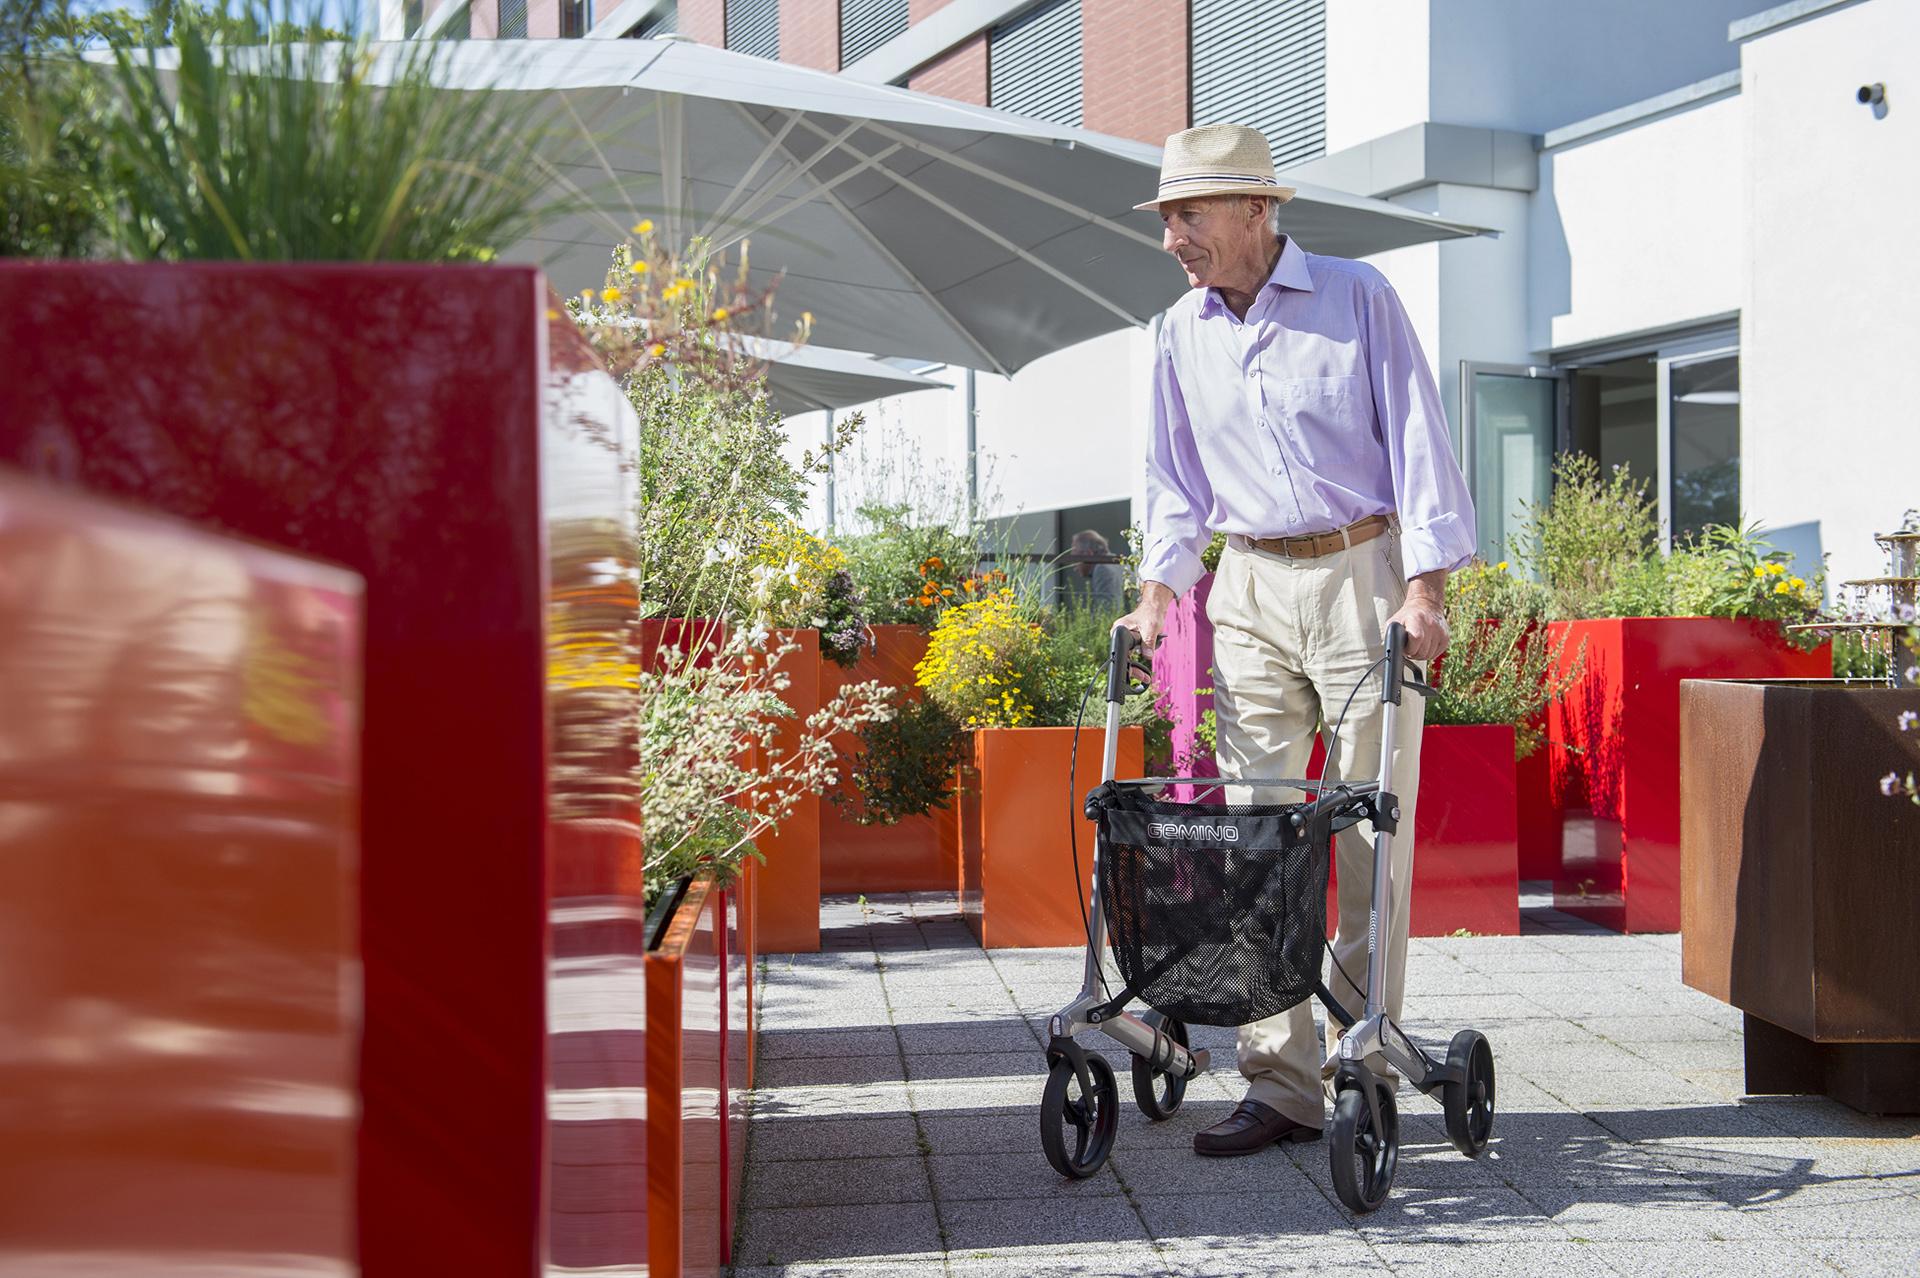 Man met Gemino 30 Parkinsonrollator van Sunrise Medical